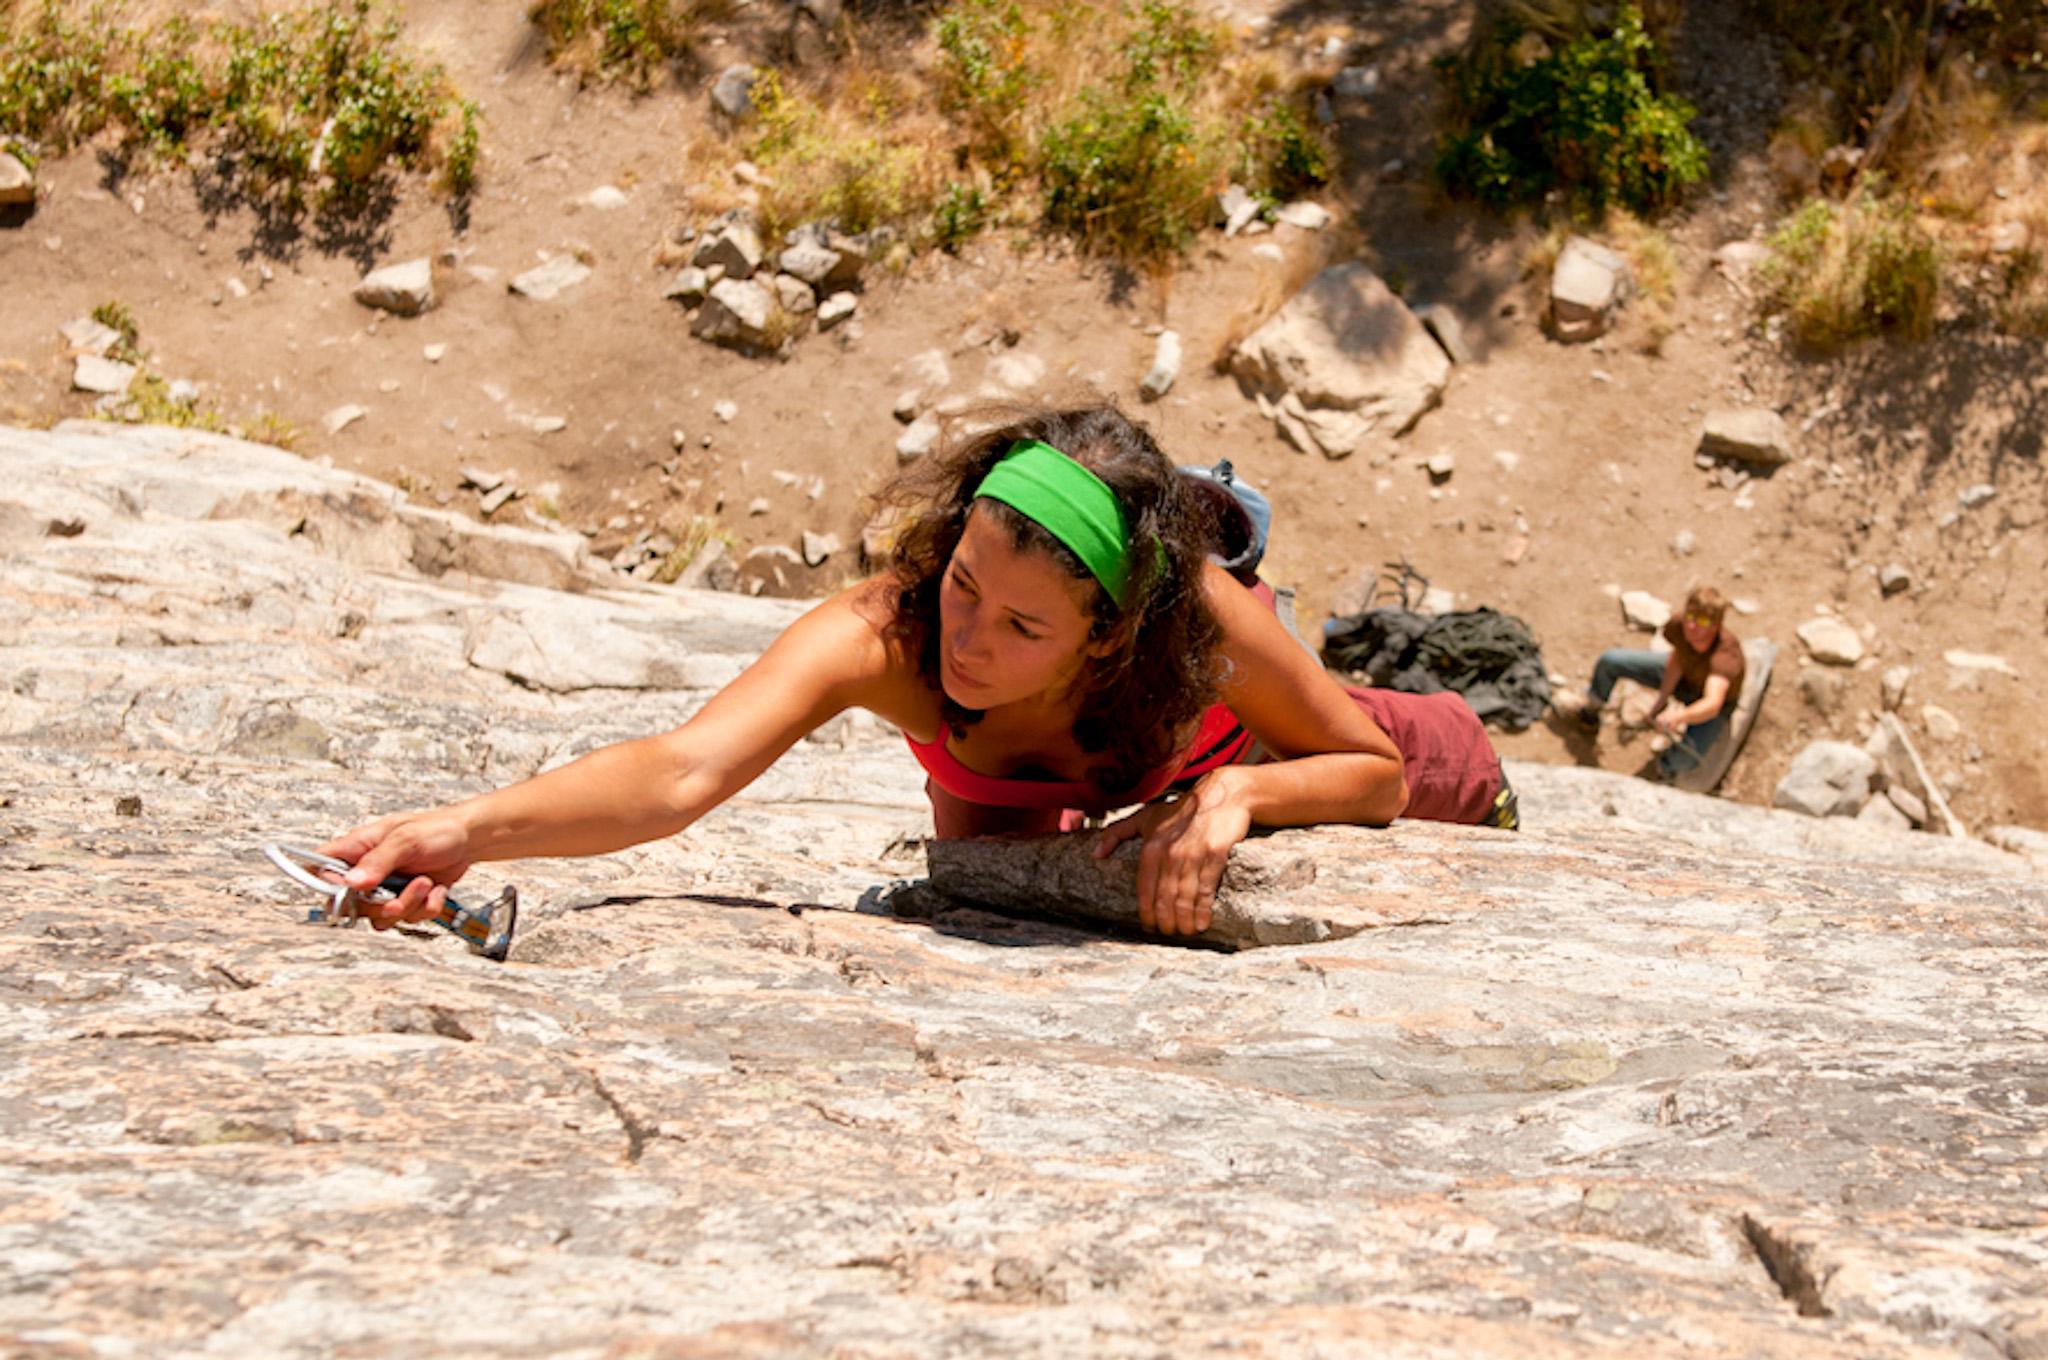 Bianca Bauza lead climbing in Skaha Bluffs, Penticton B.C.